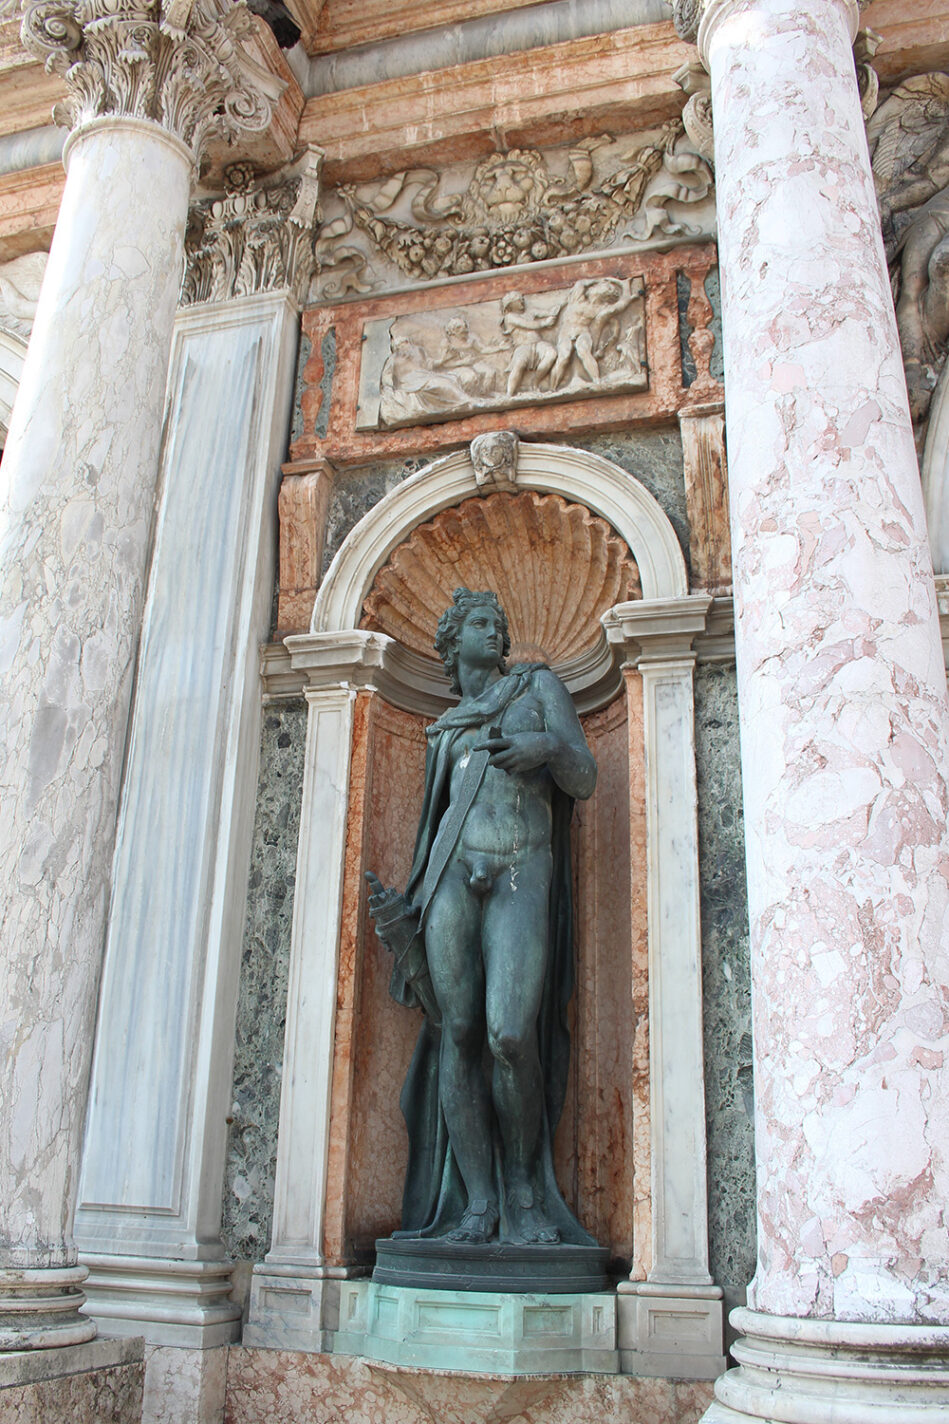 Ingang van de Campanile op Piazza San Marco